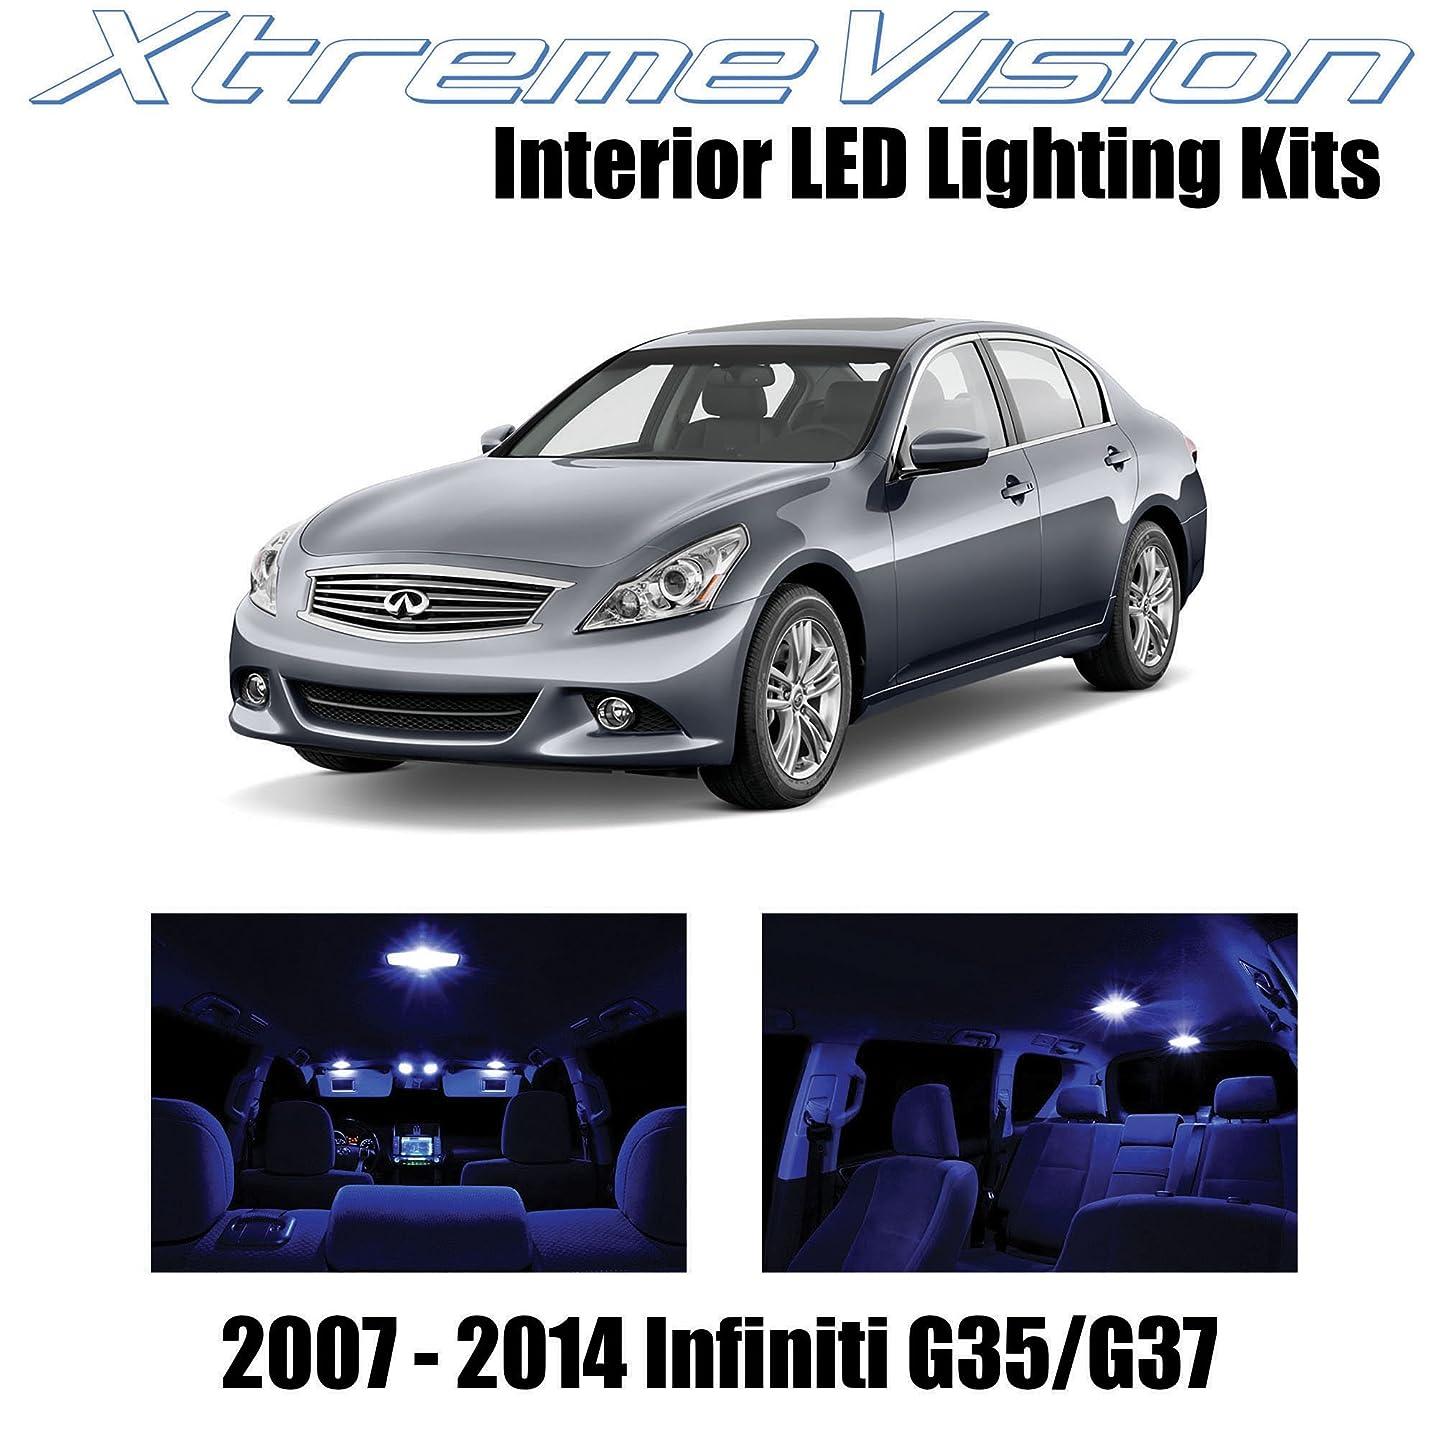 XtremeVision Interior LED for Infiniti G35 G37 Sedan 2007-2014 (10 Pieces) Blue Interior LED Kit + Installation Tool